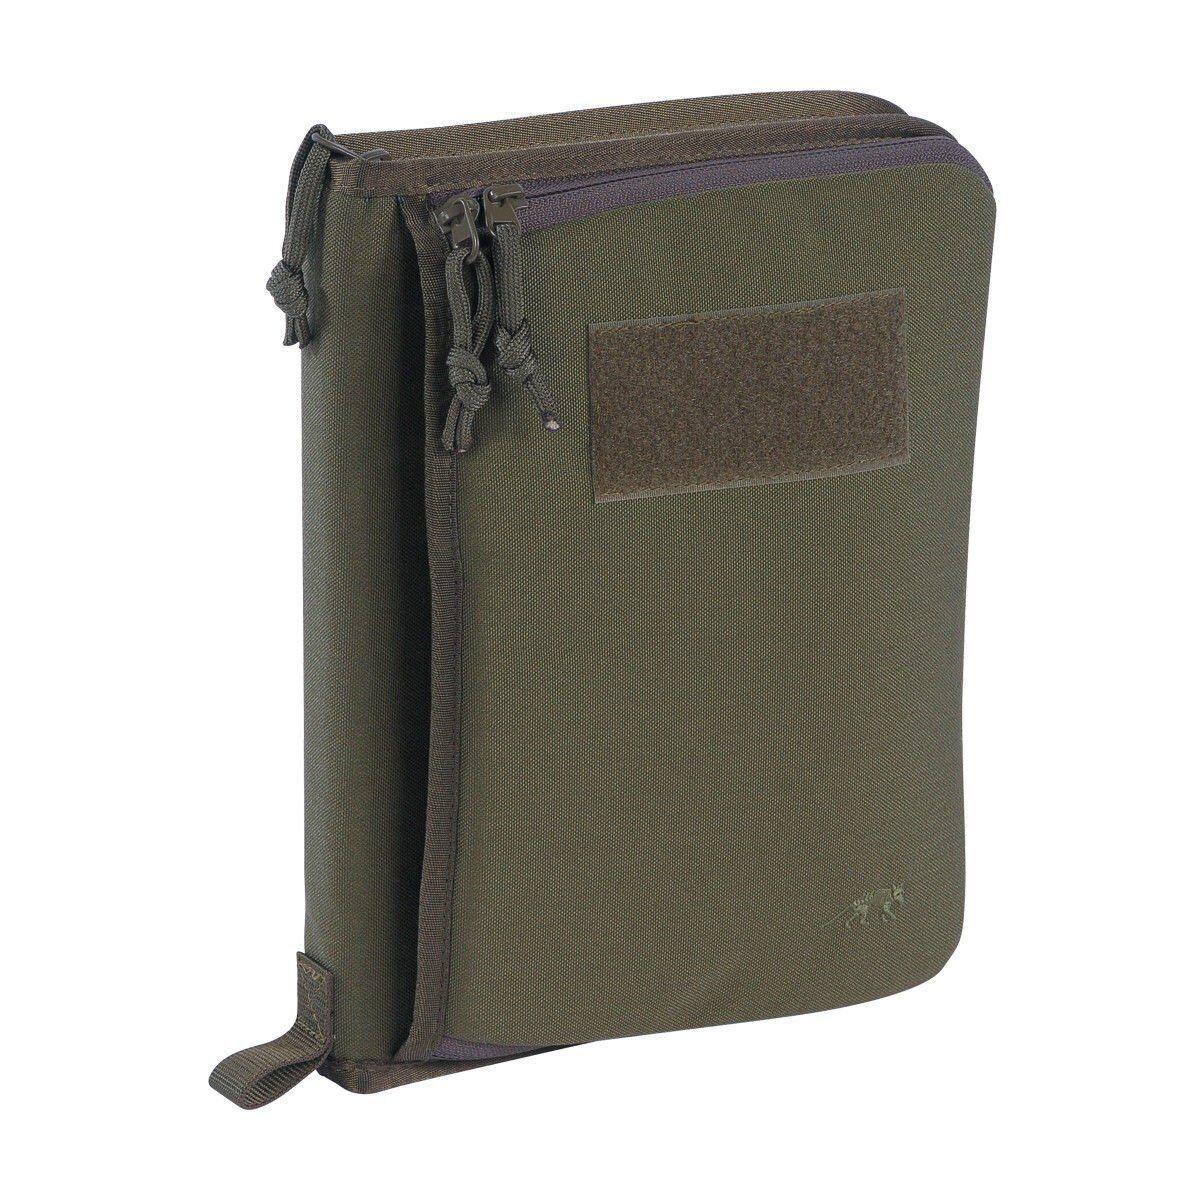 Чехол для планшета Tasmanian Tiger - Tactical Touch Pad Cover Khaki (TT 7749.343)